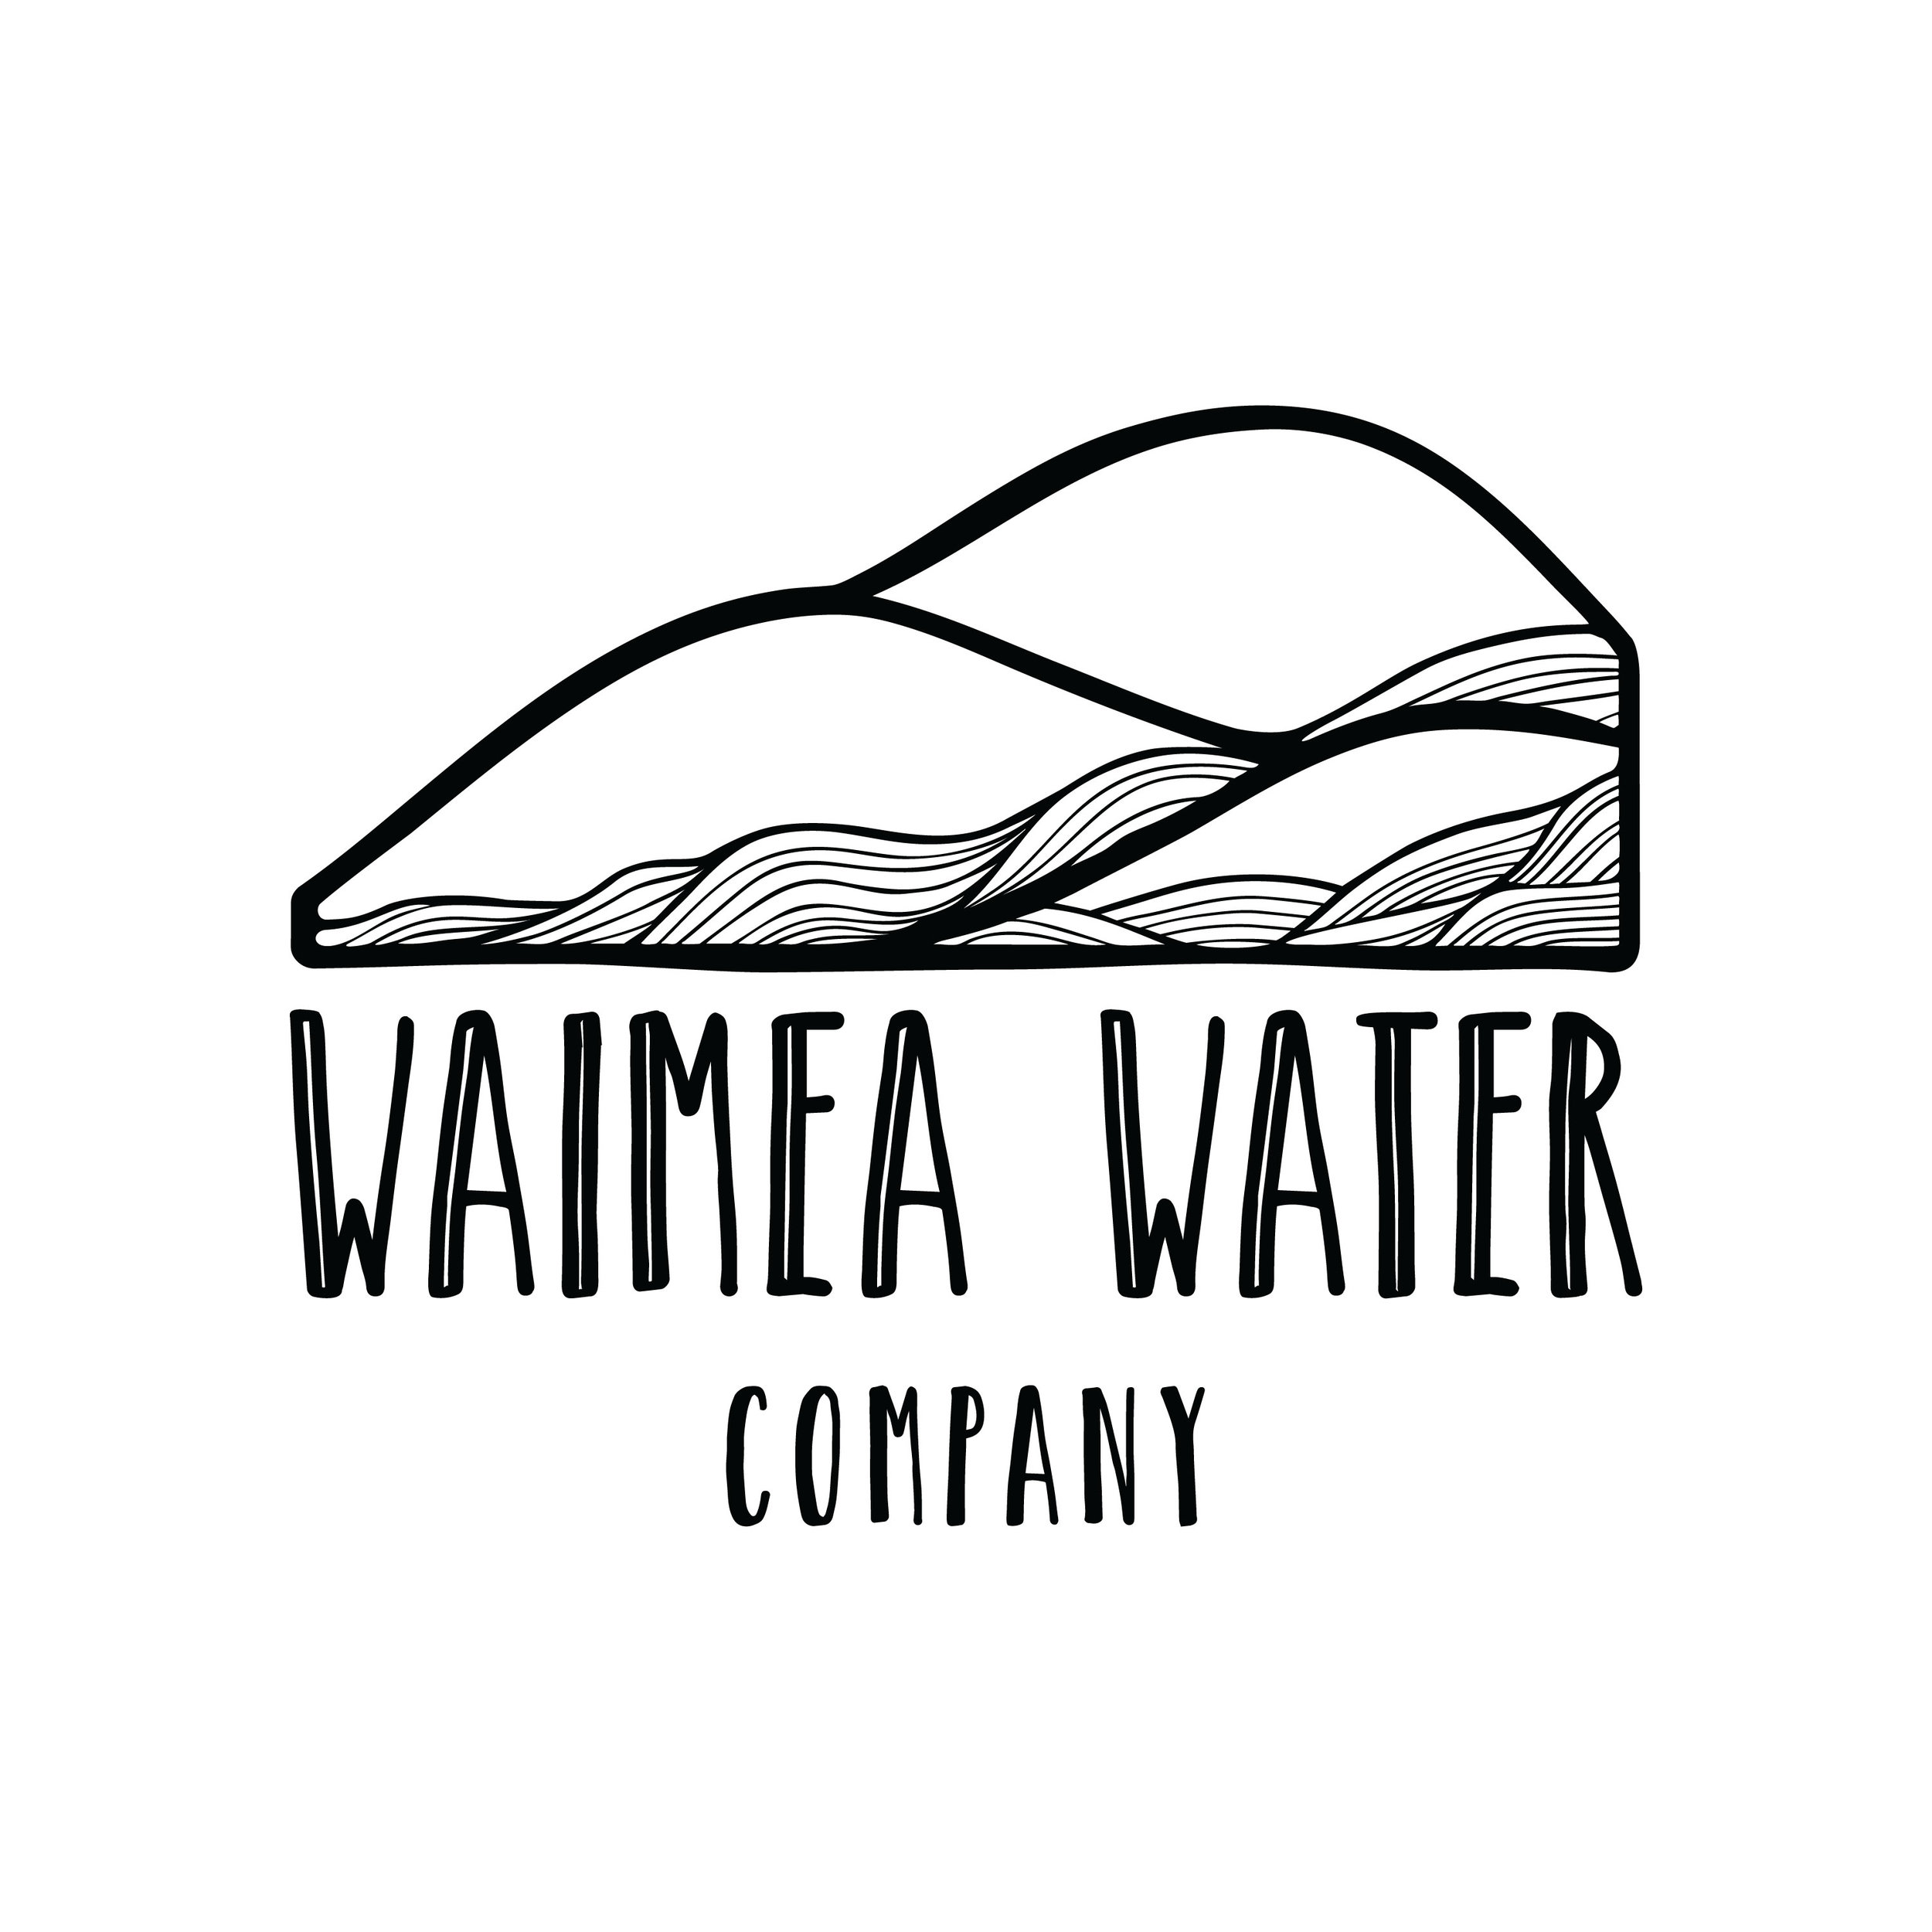 WaimeaWaterCompany_Logo_Black.jpg